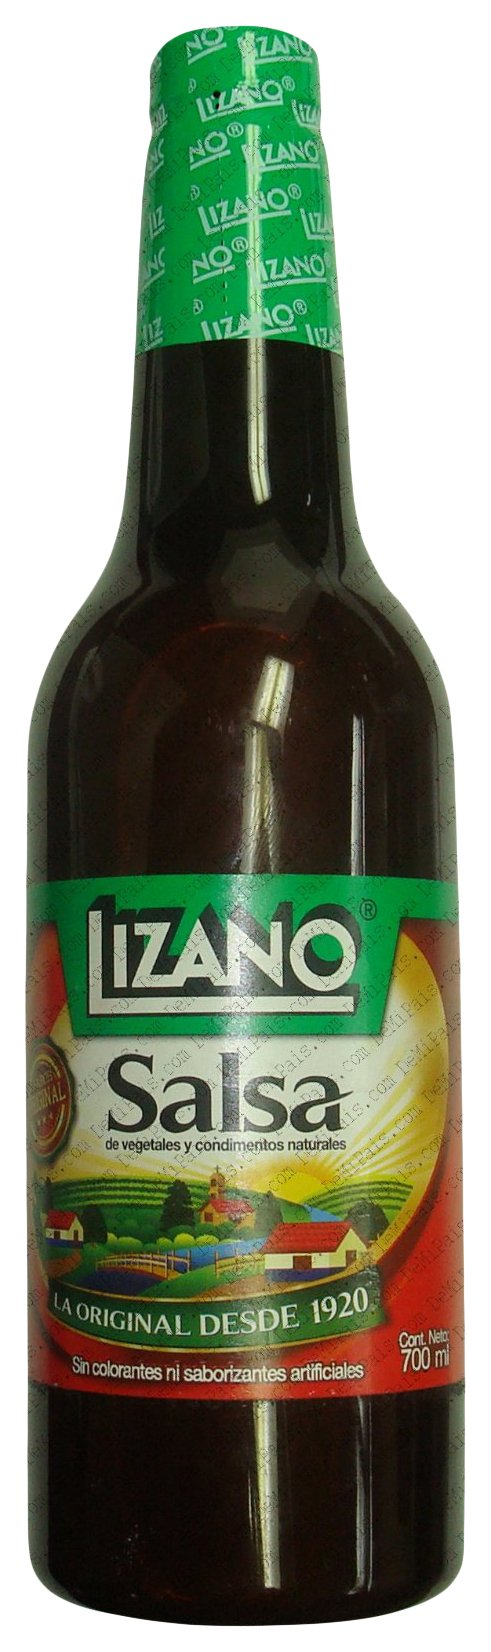 Lizano Salsa 700 mL/23 oz., 6 Bottle by Lizano